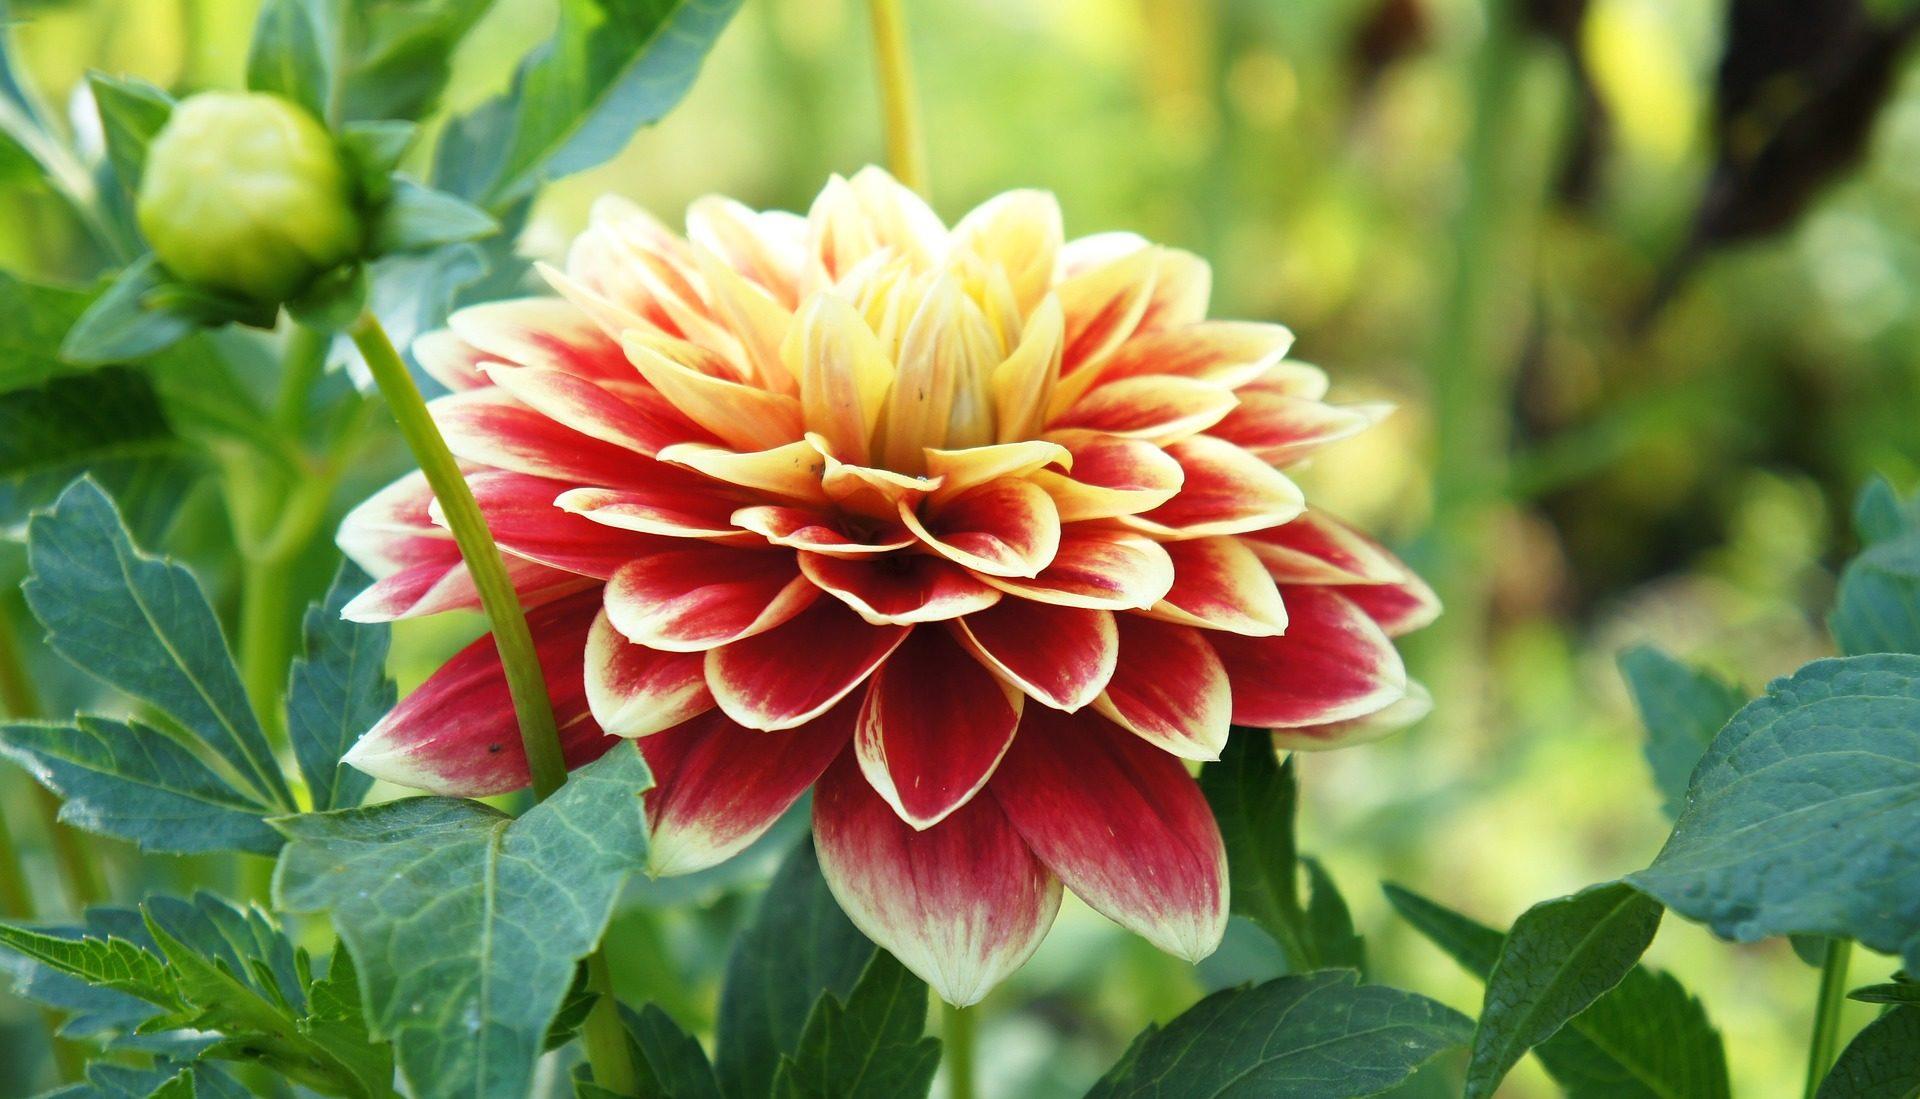 flor, dalia, planta, pétalos, colorida, belleza - Fondos de Pantalla HD - professor-falken.com